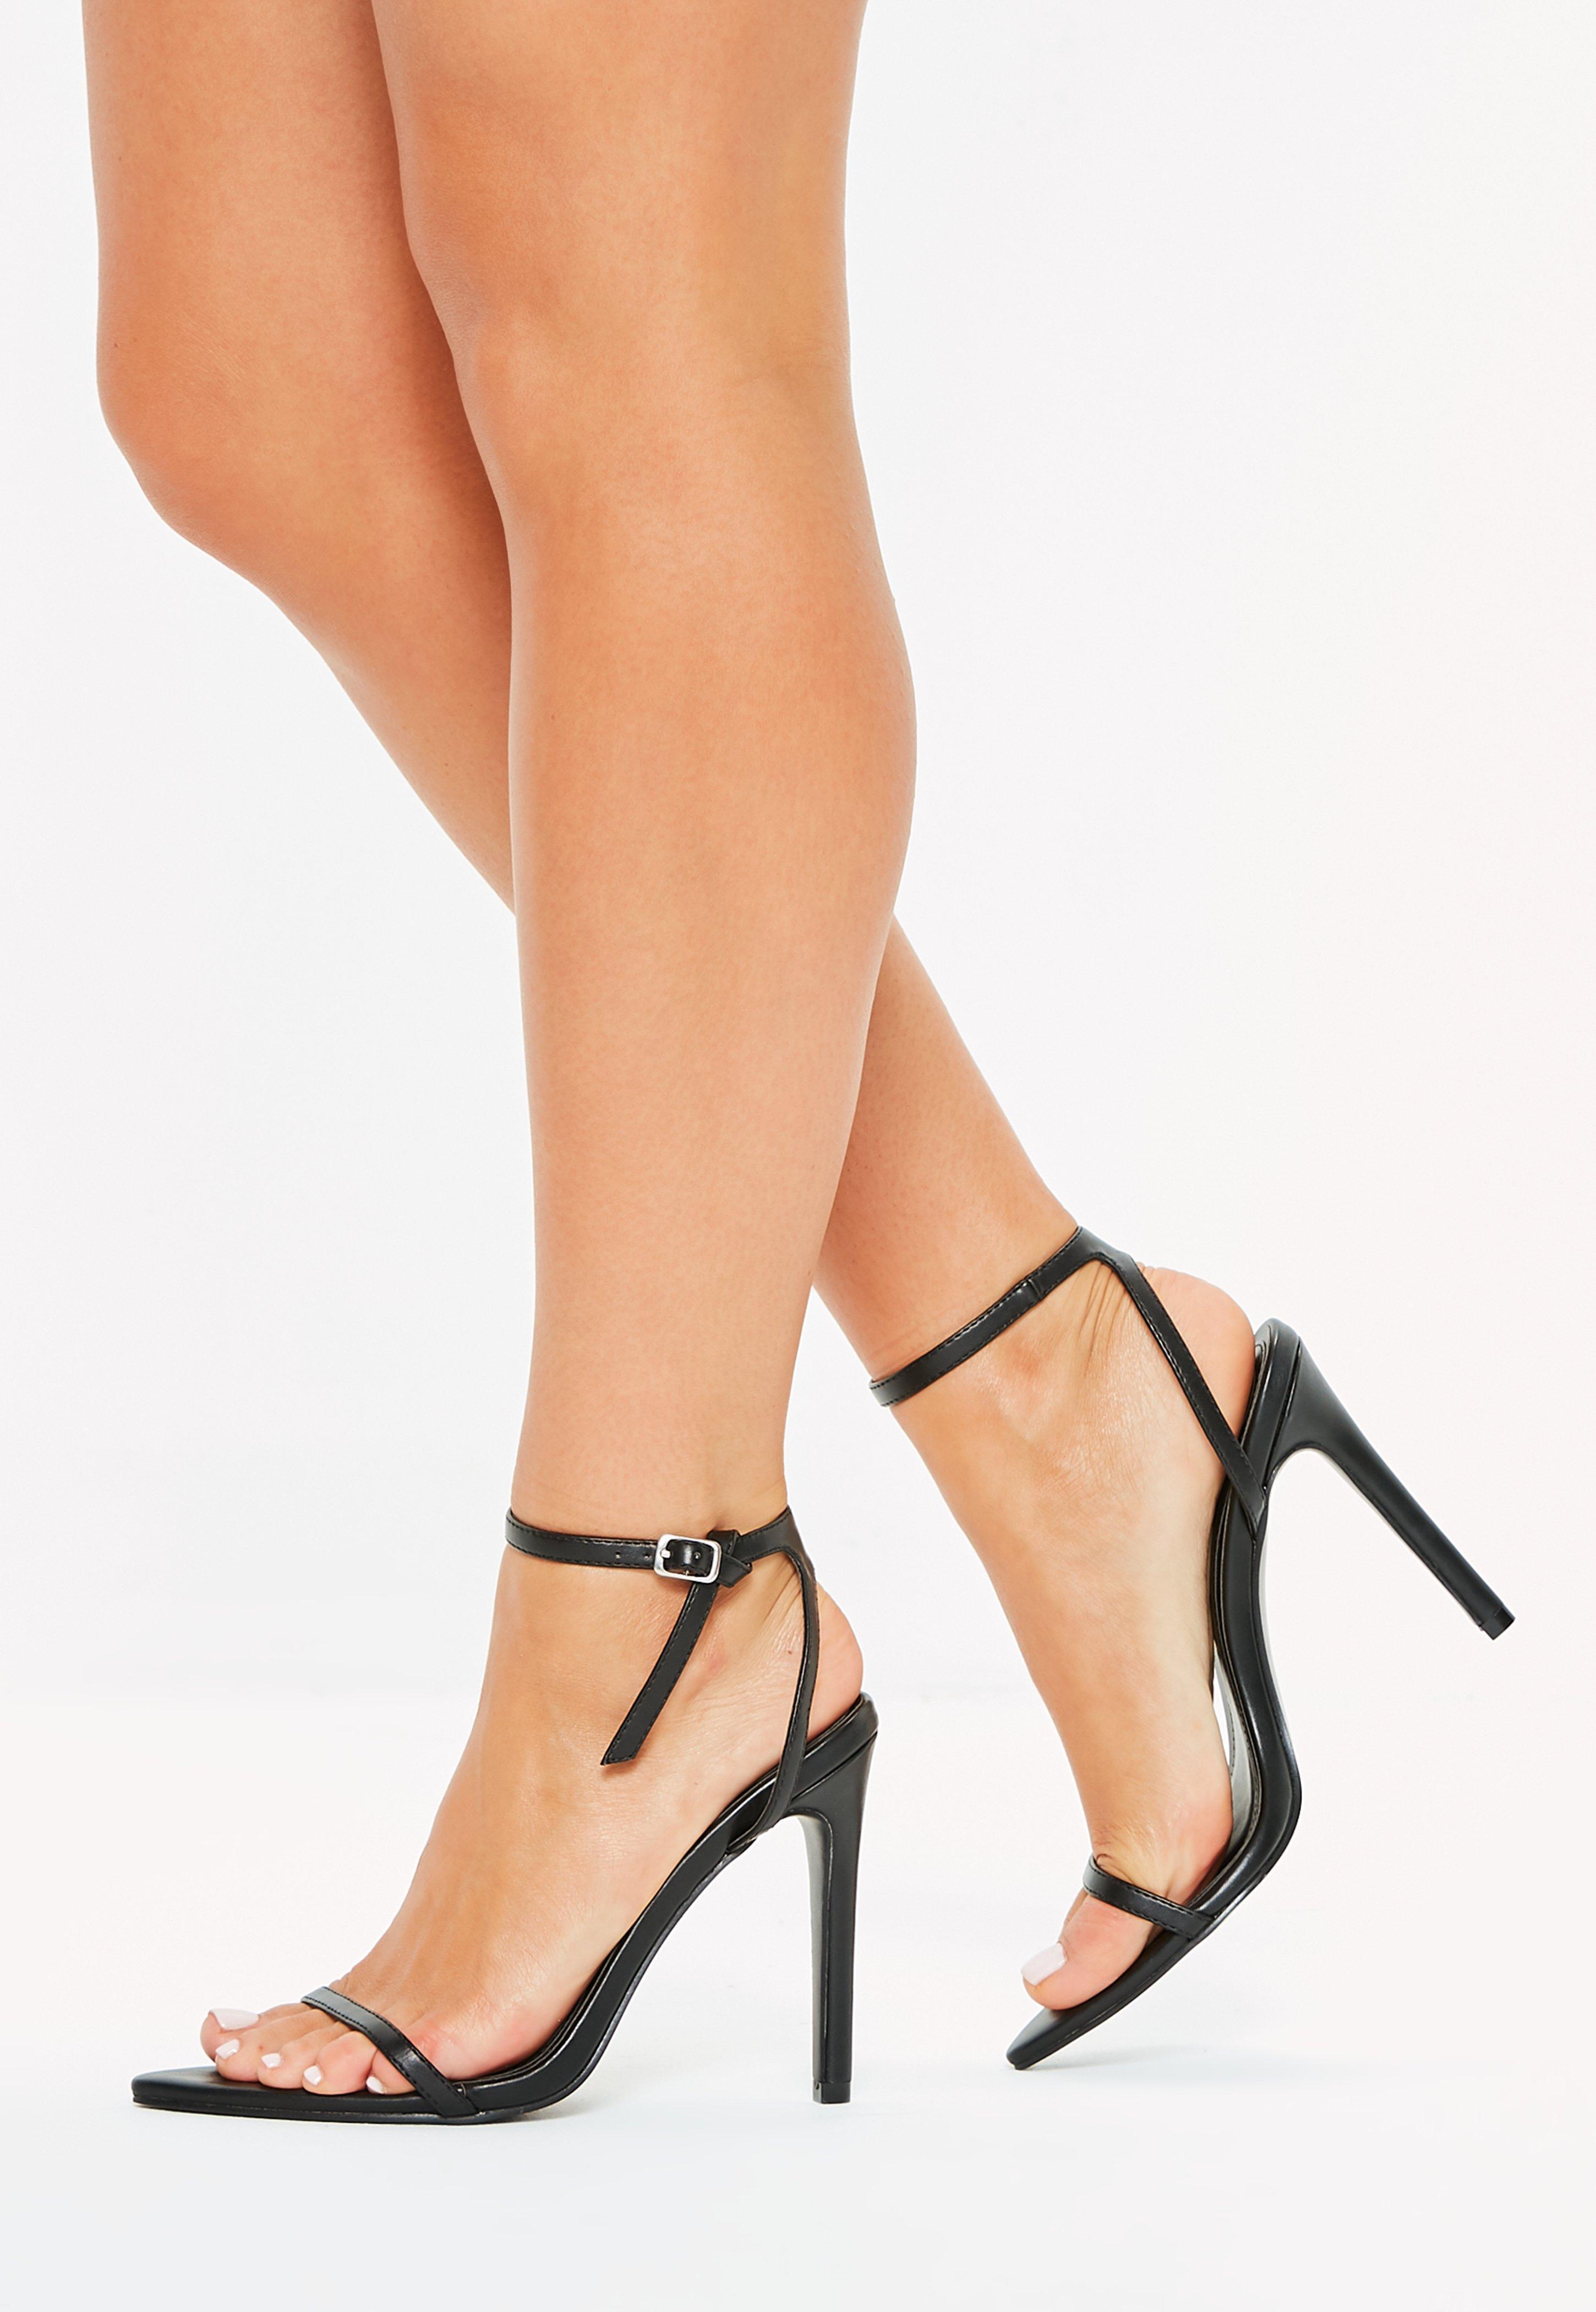 Skinny Strap Wrap Sandal Heels - Lyst